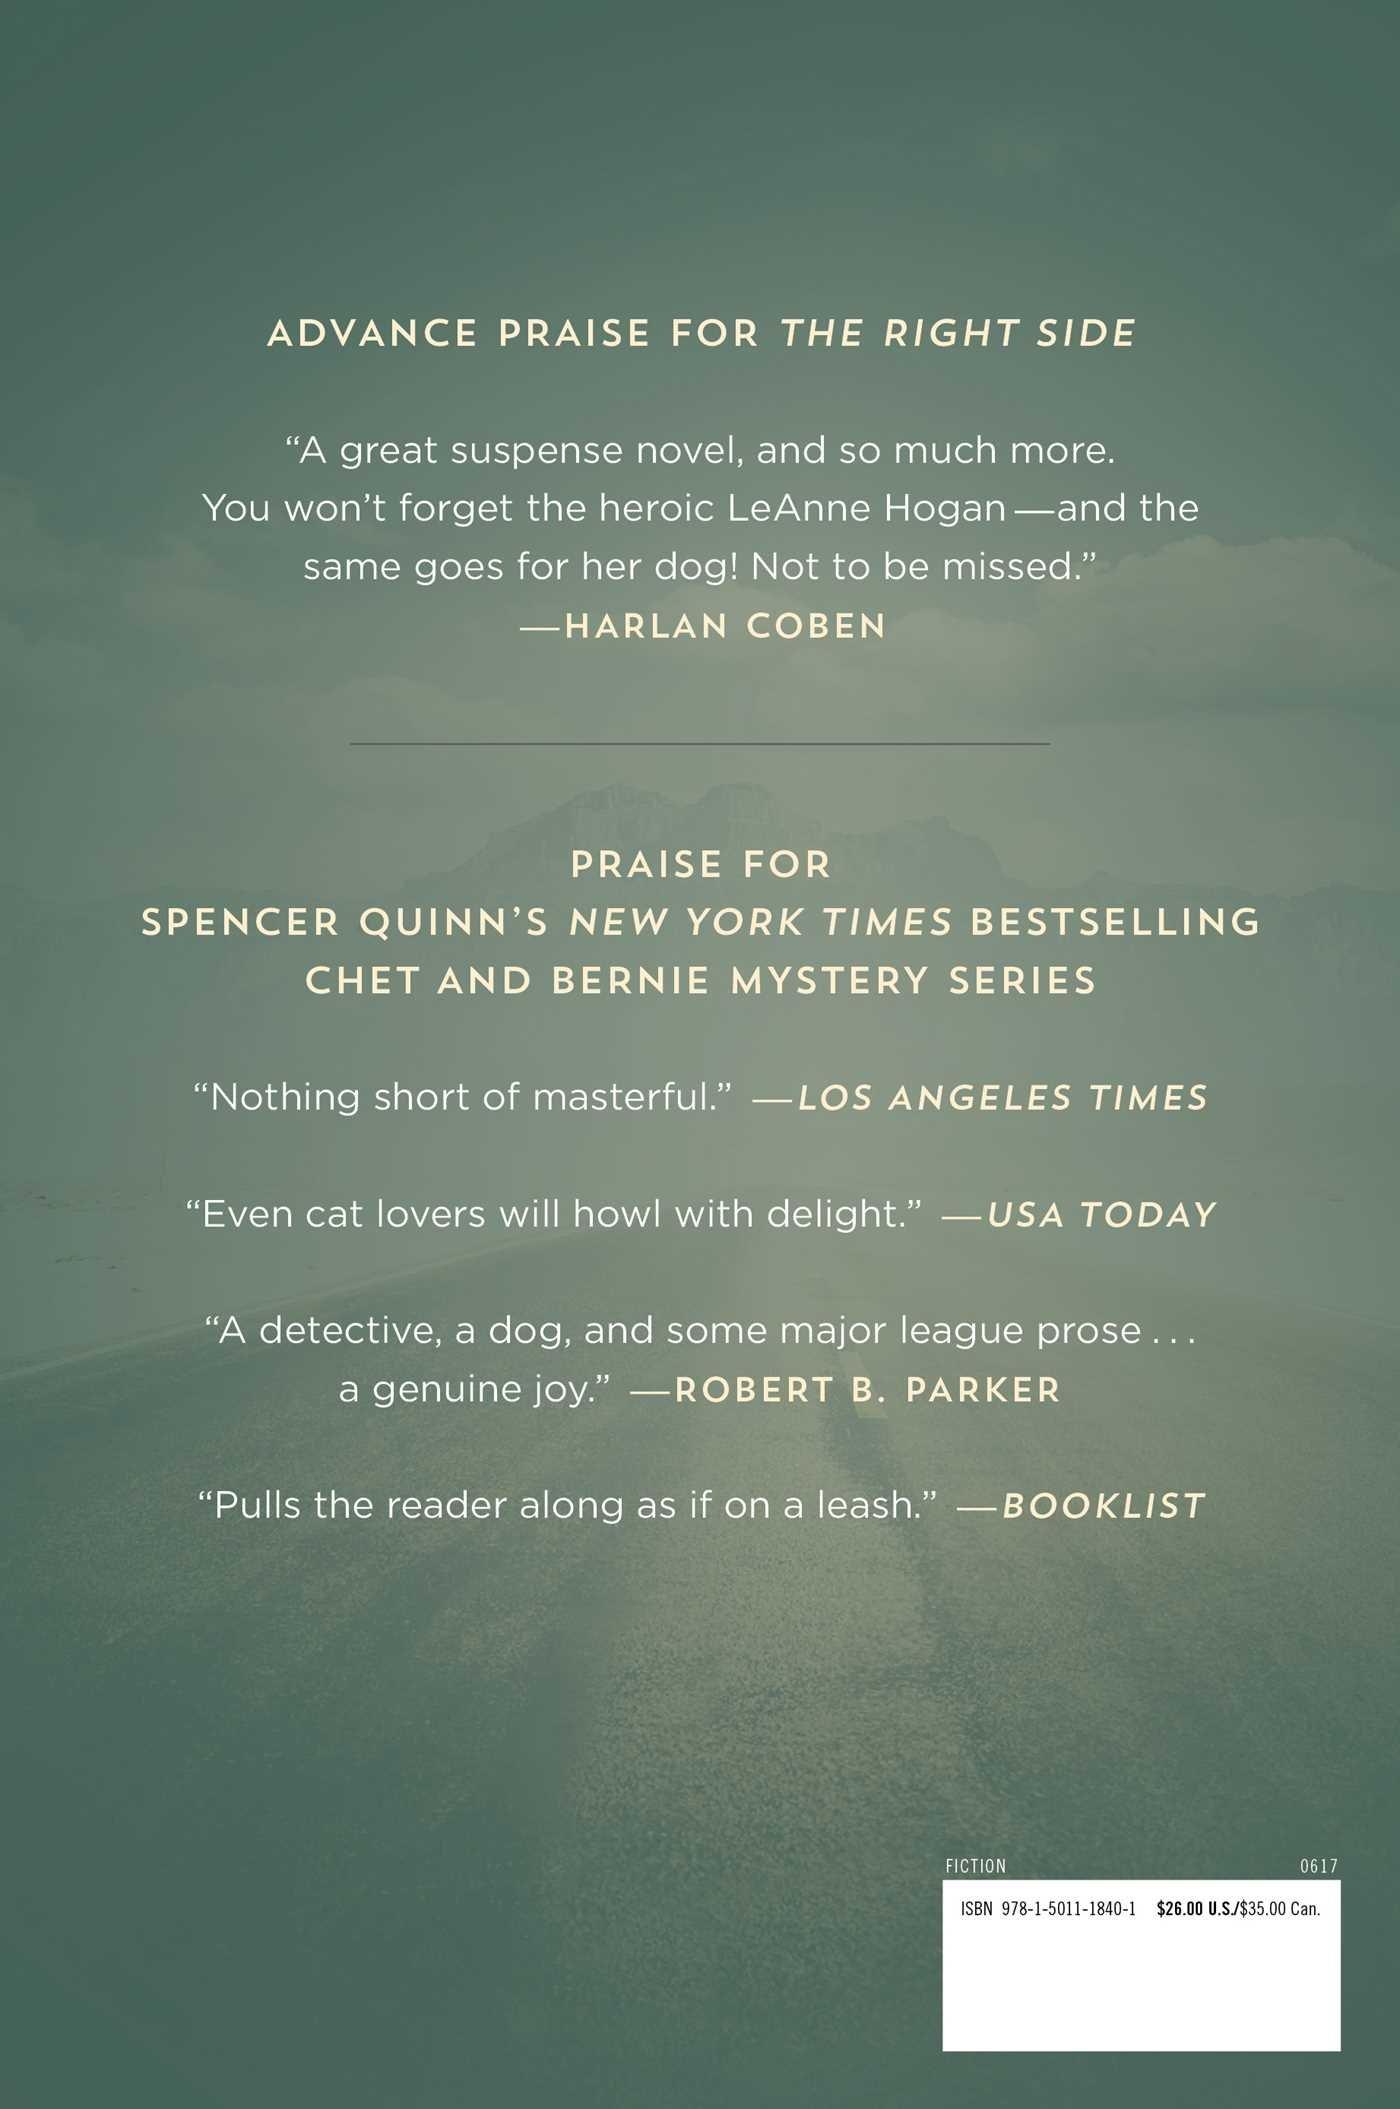 Amazon: The Right Side: A Novel (9781501118401): Spencer Quinn: Books